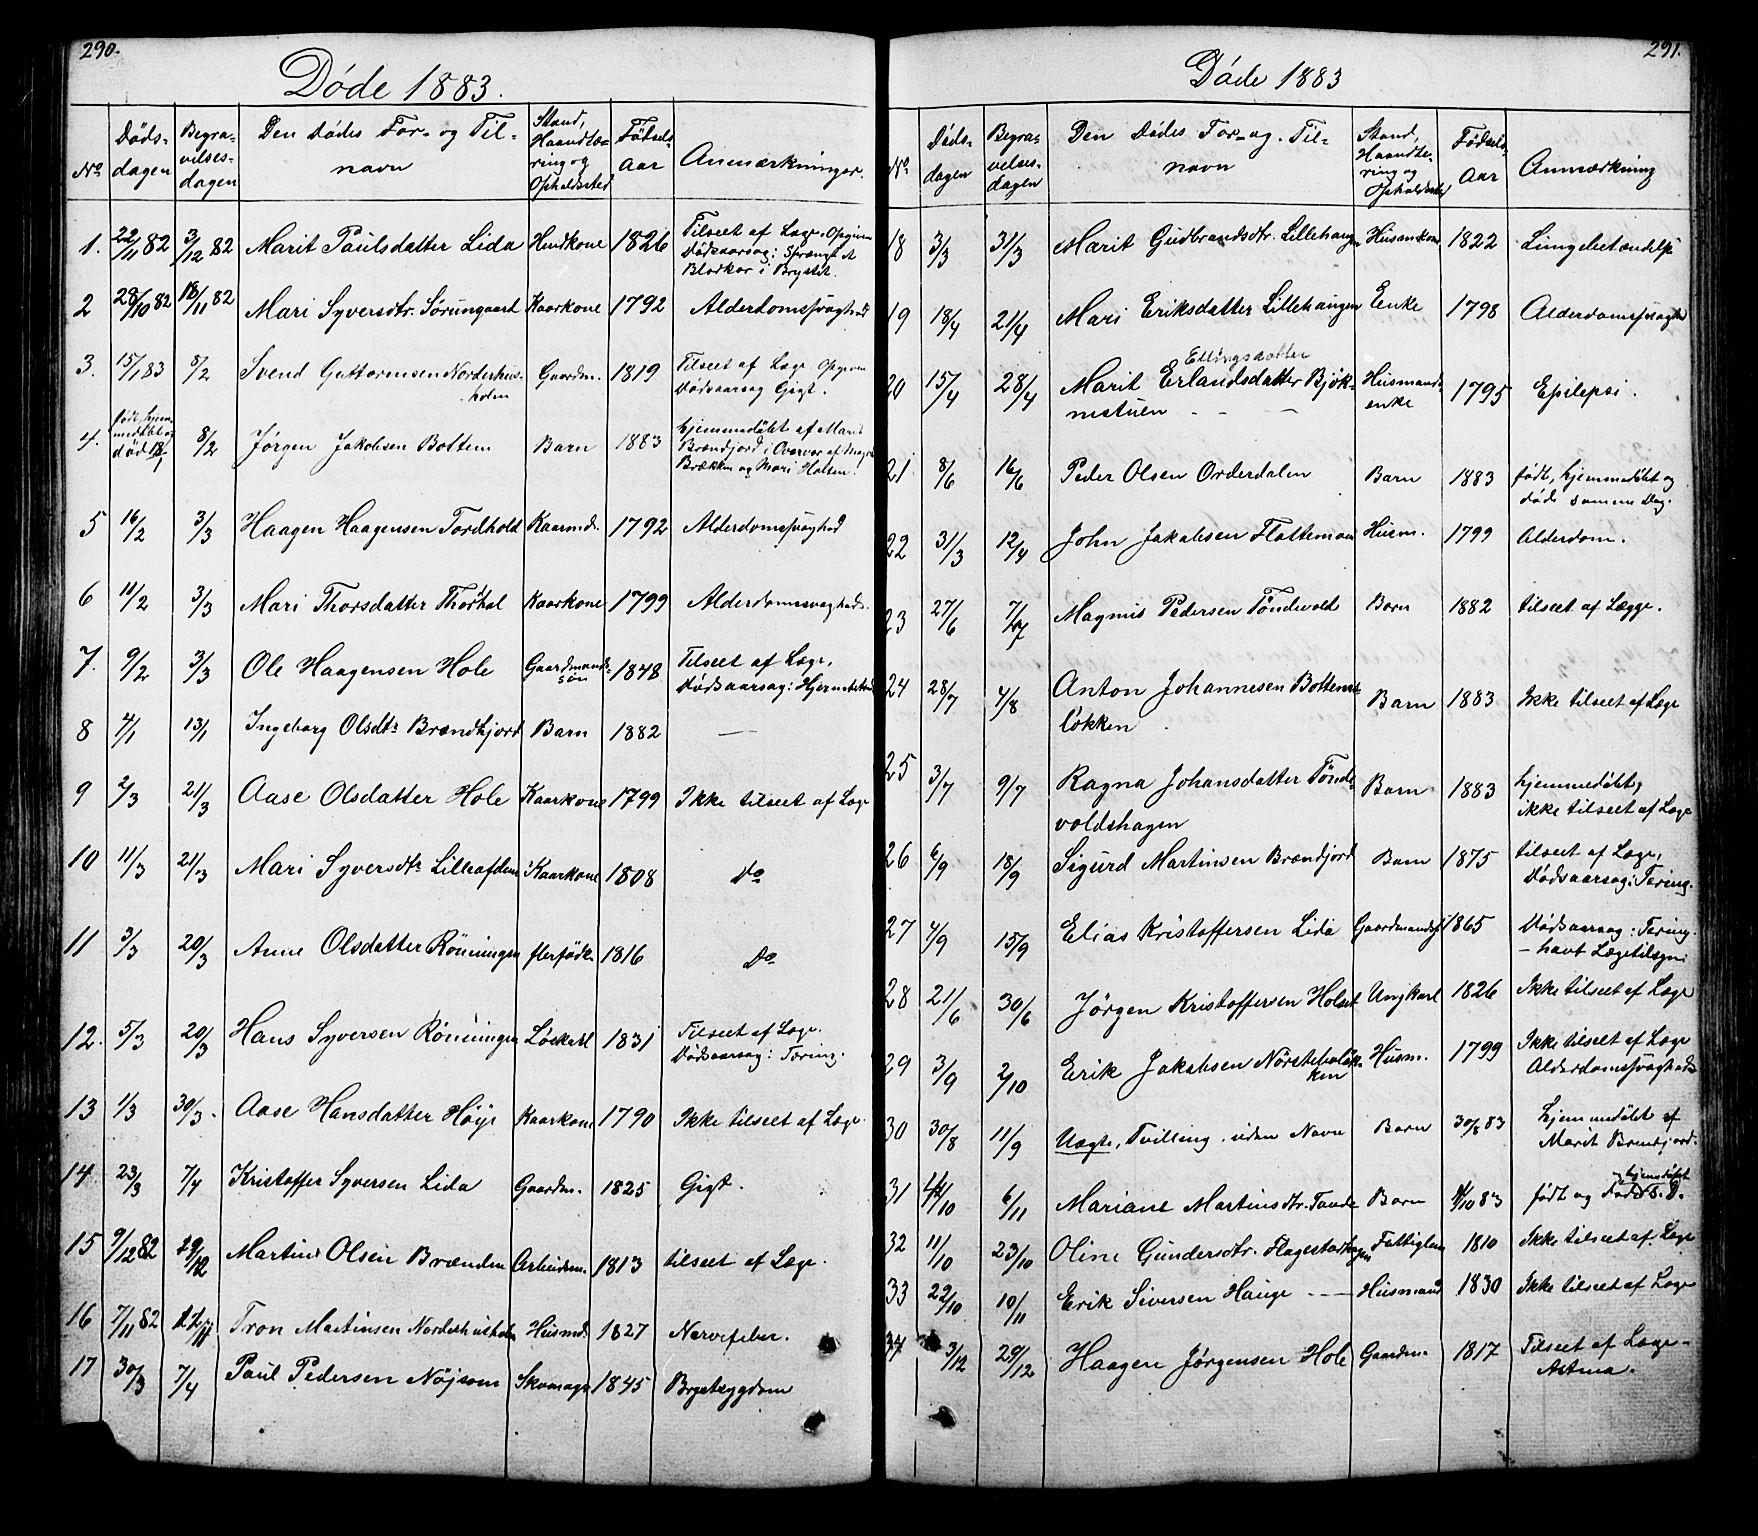 SAH, Lesja prestekontor, Klokkerbok nr. 5, 1850-1894, s. 290-291